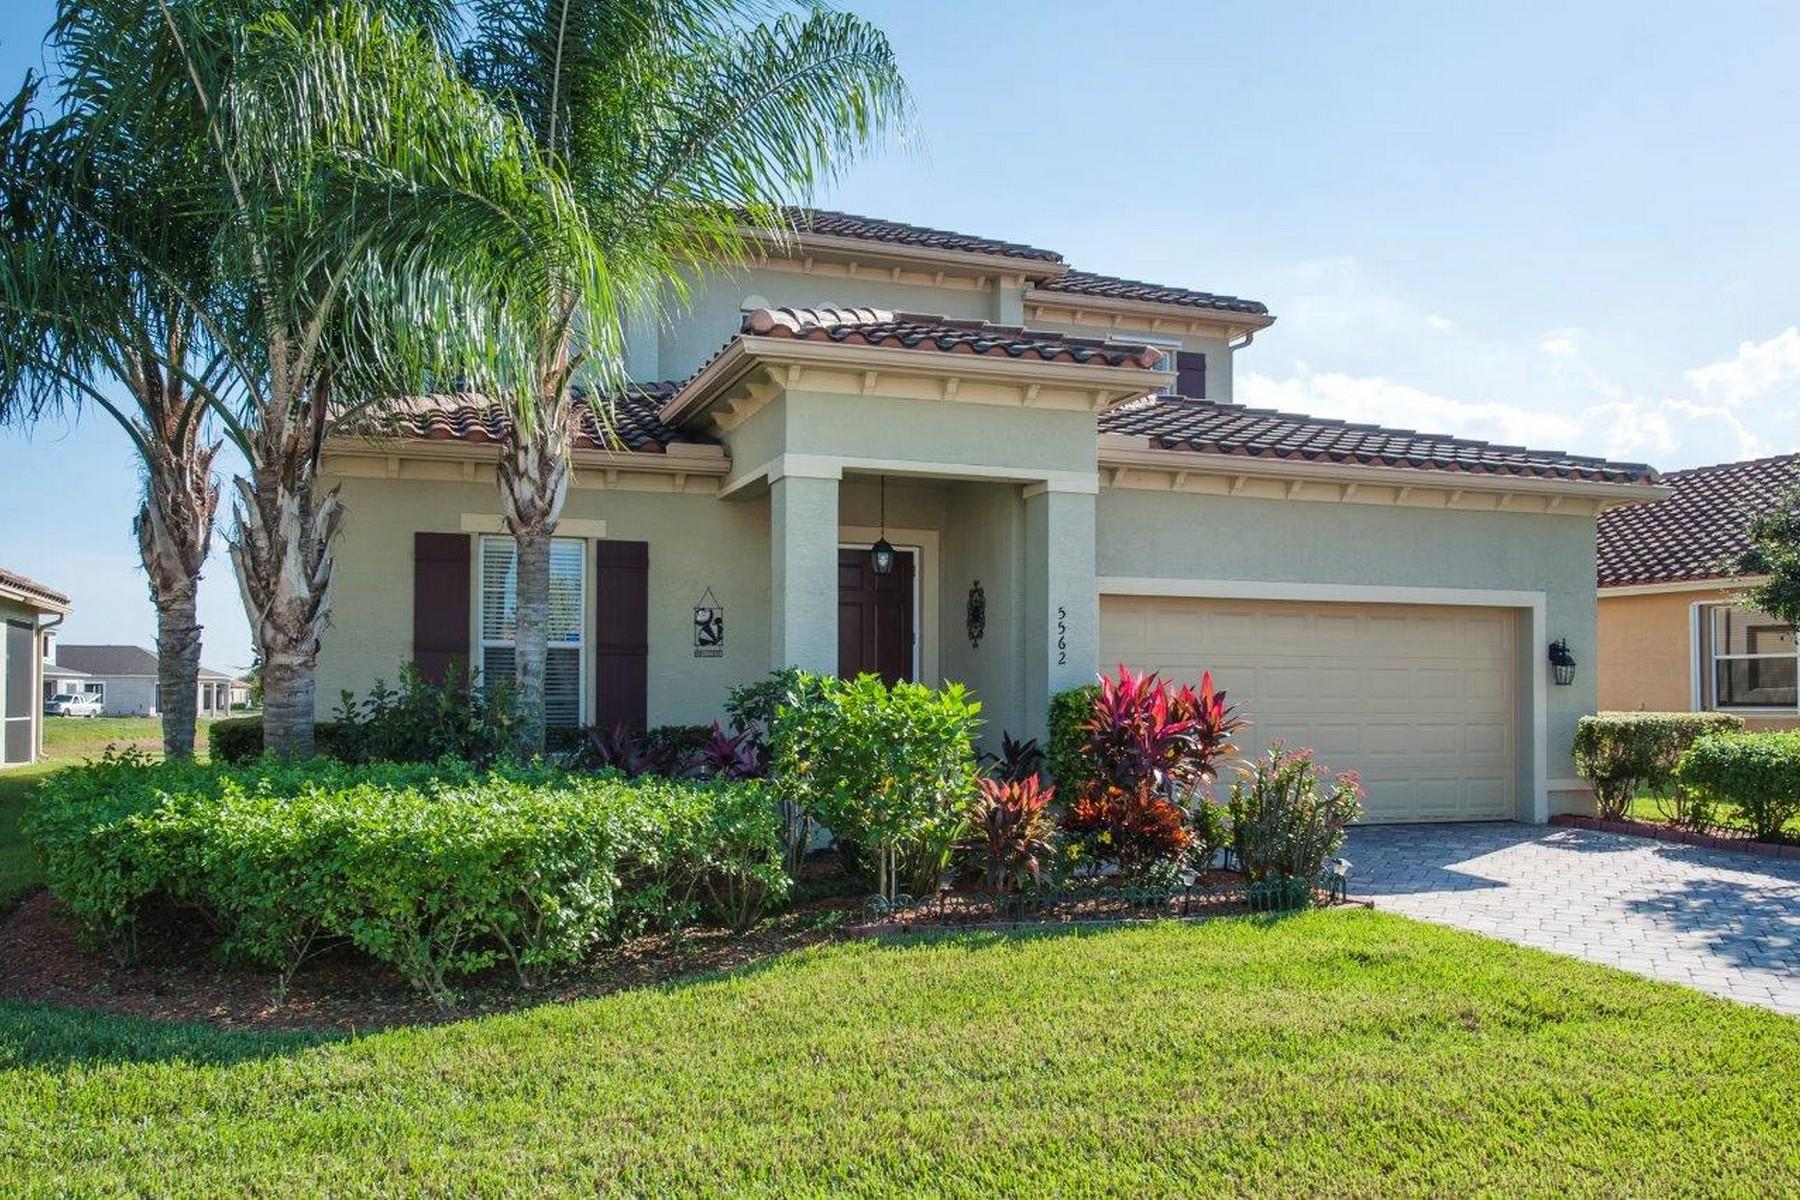 Casa Unifamiliar por un Venta en Gorgeous Verolago Home on Lake 5562 57th Way Vero Beach, Florida, 32967 Estados Unidos